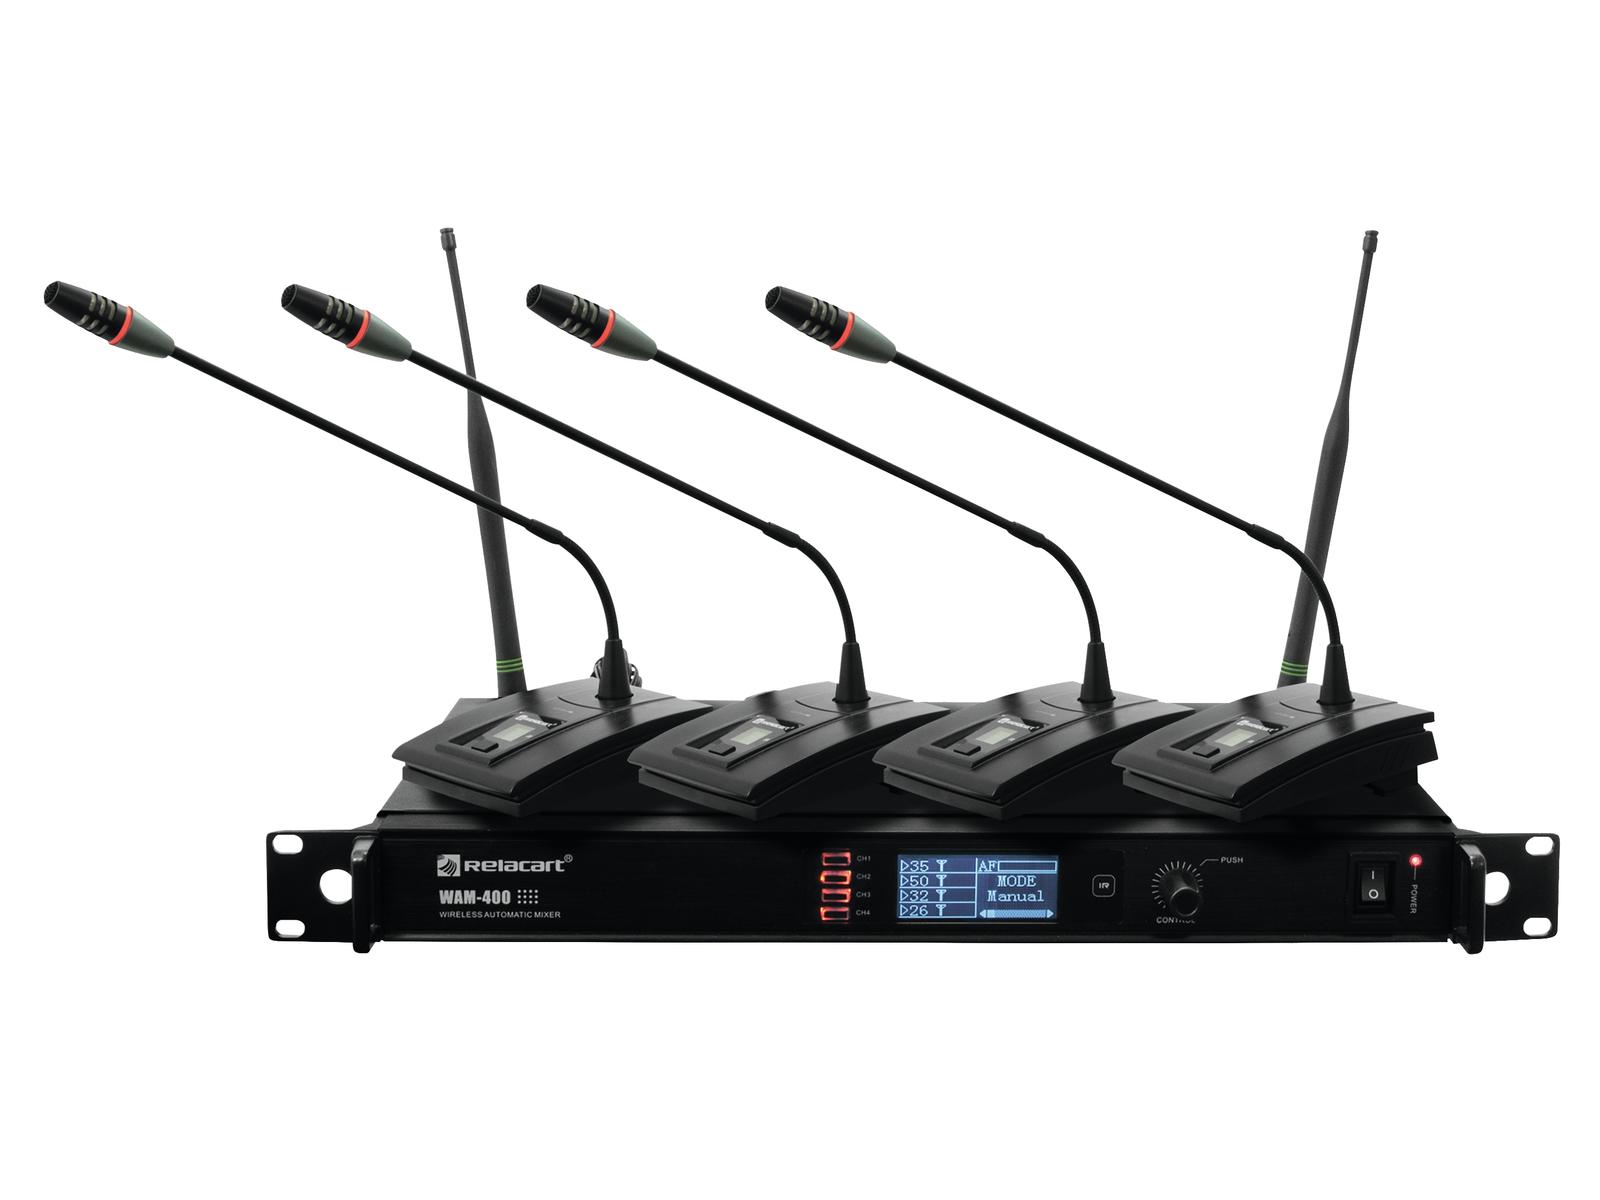 Set Microfoni digitali con mixer a 4 canali per conferenze gooseneck UHF